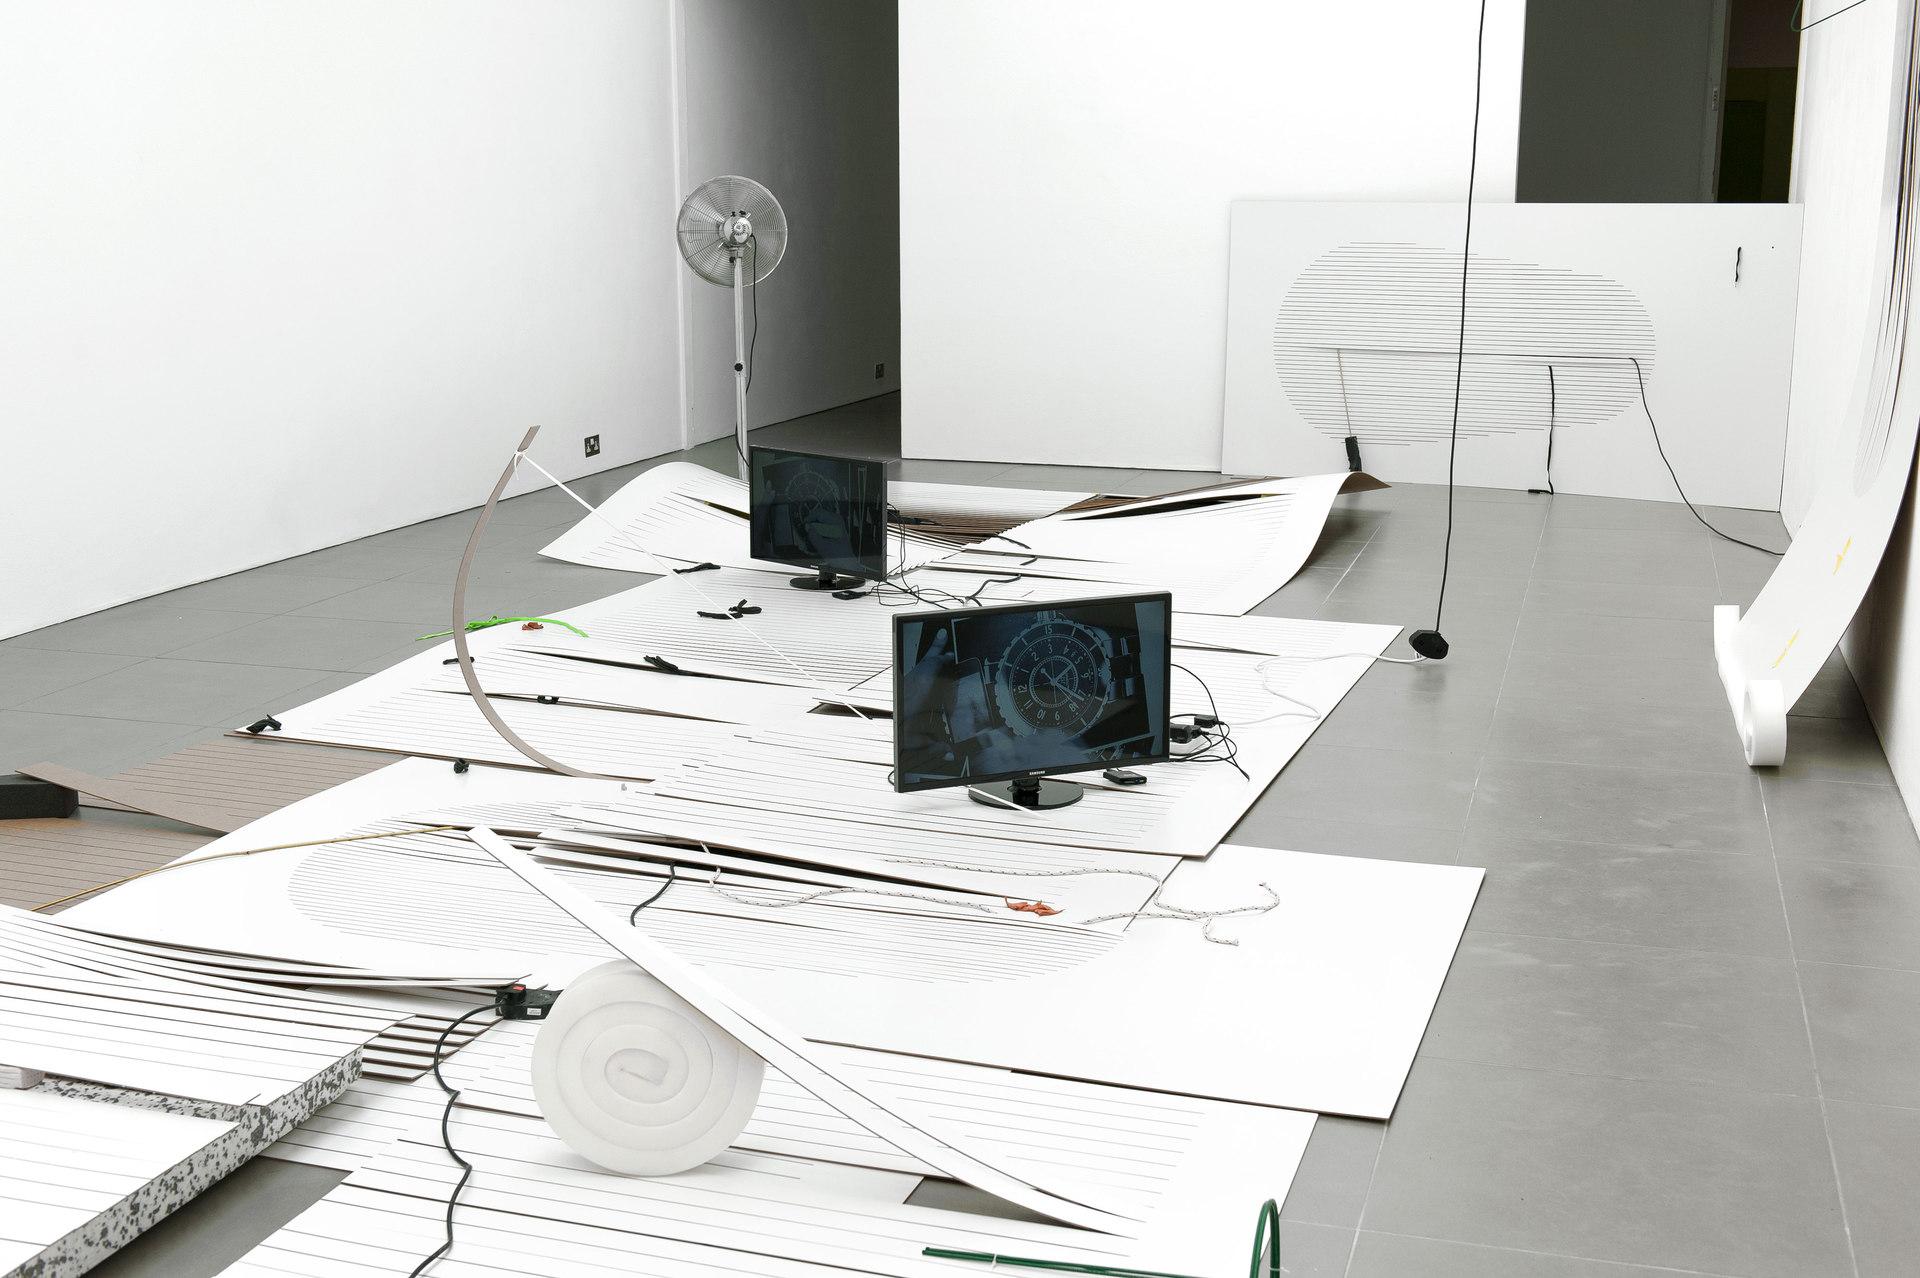 Beatriz Olabarrieta, Shifty-Show, mixed media installation, 2014, Cell Project Space